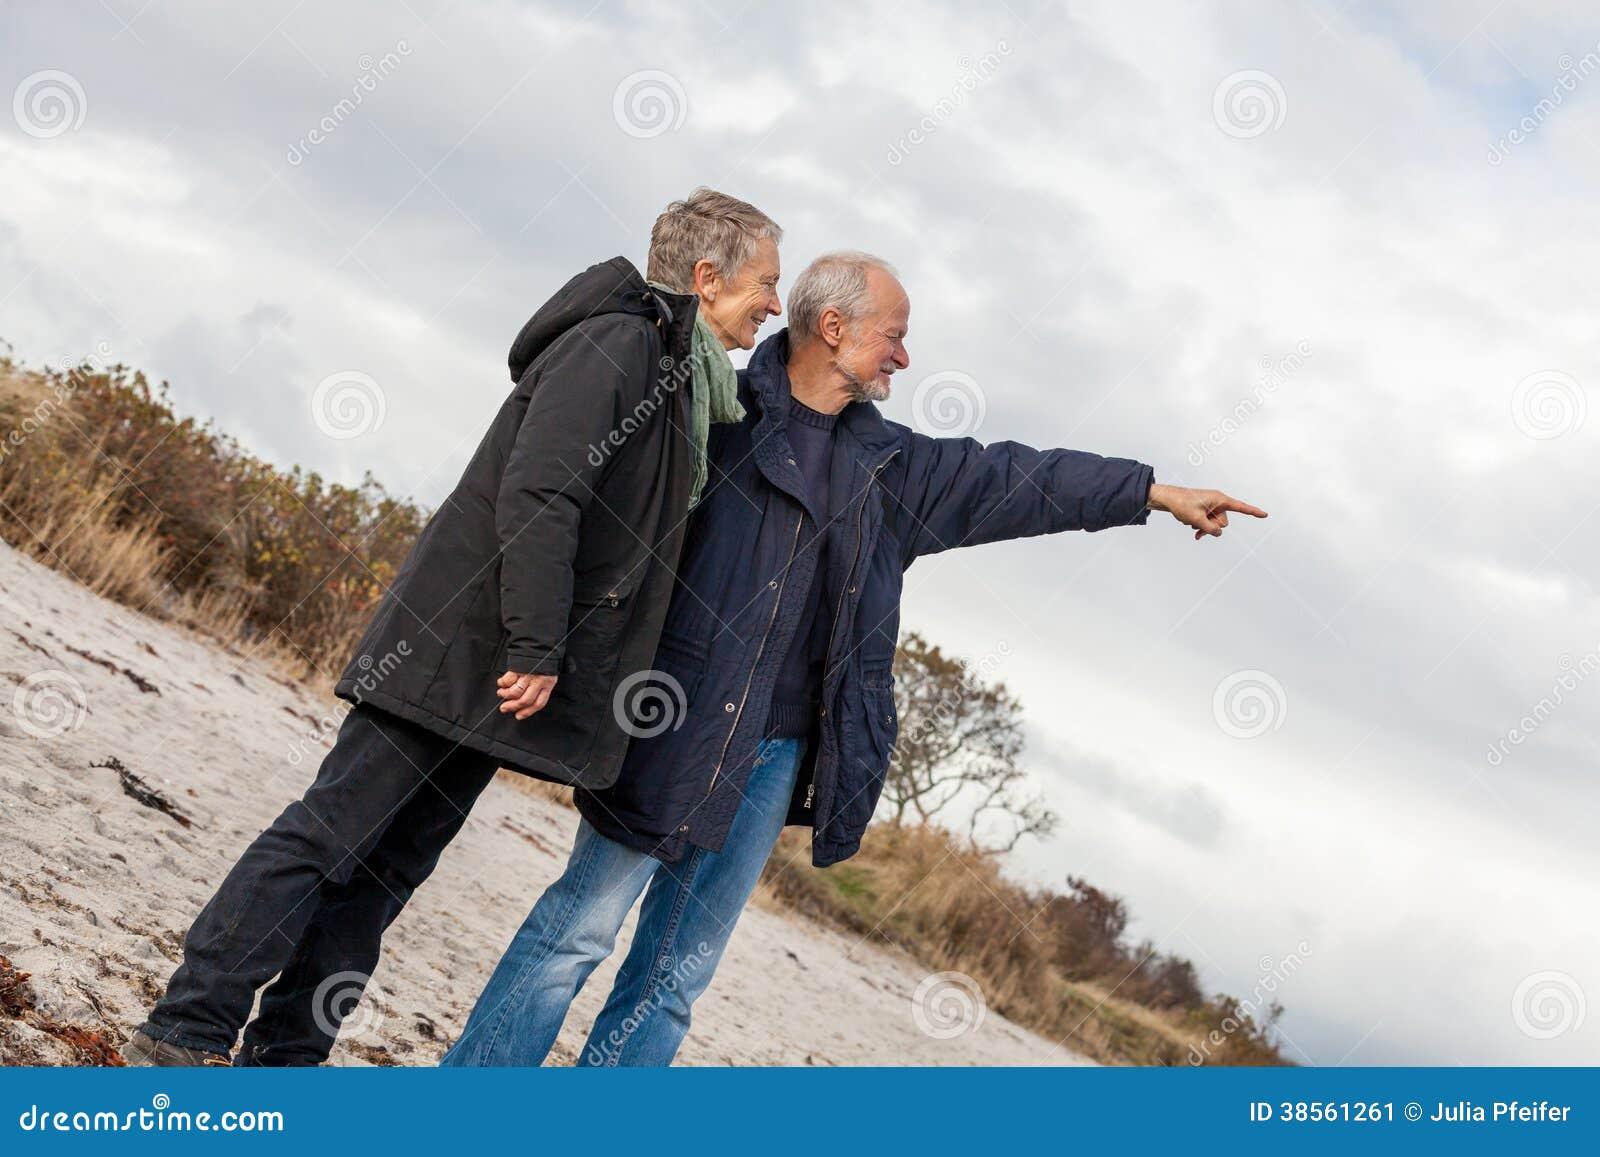 Happy senior couple elderly people together